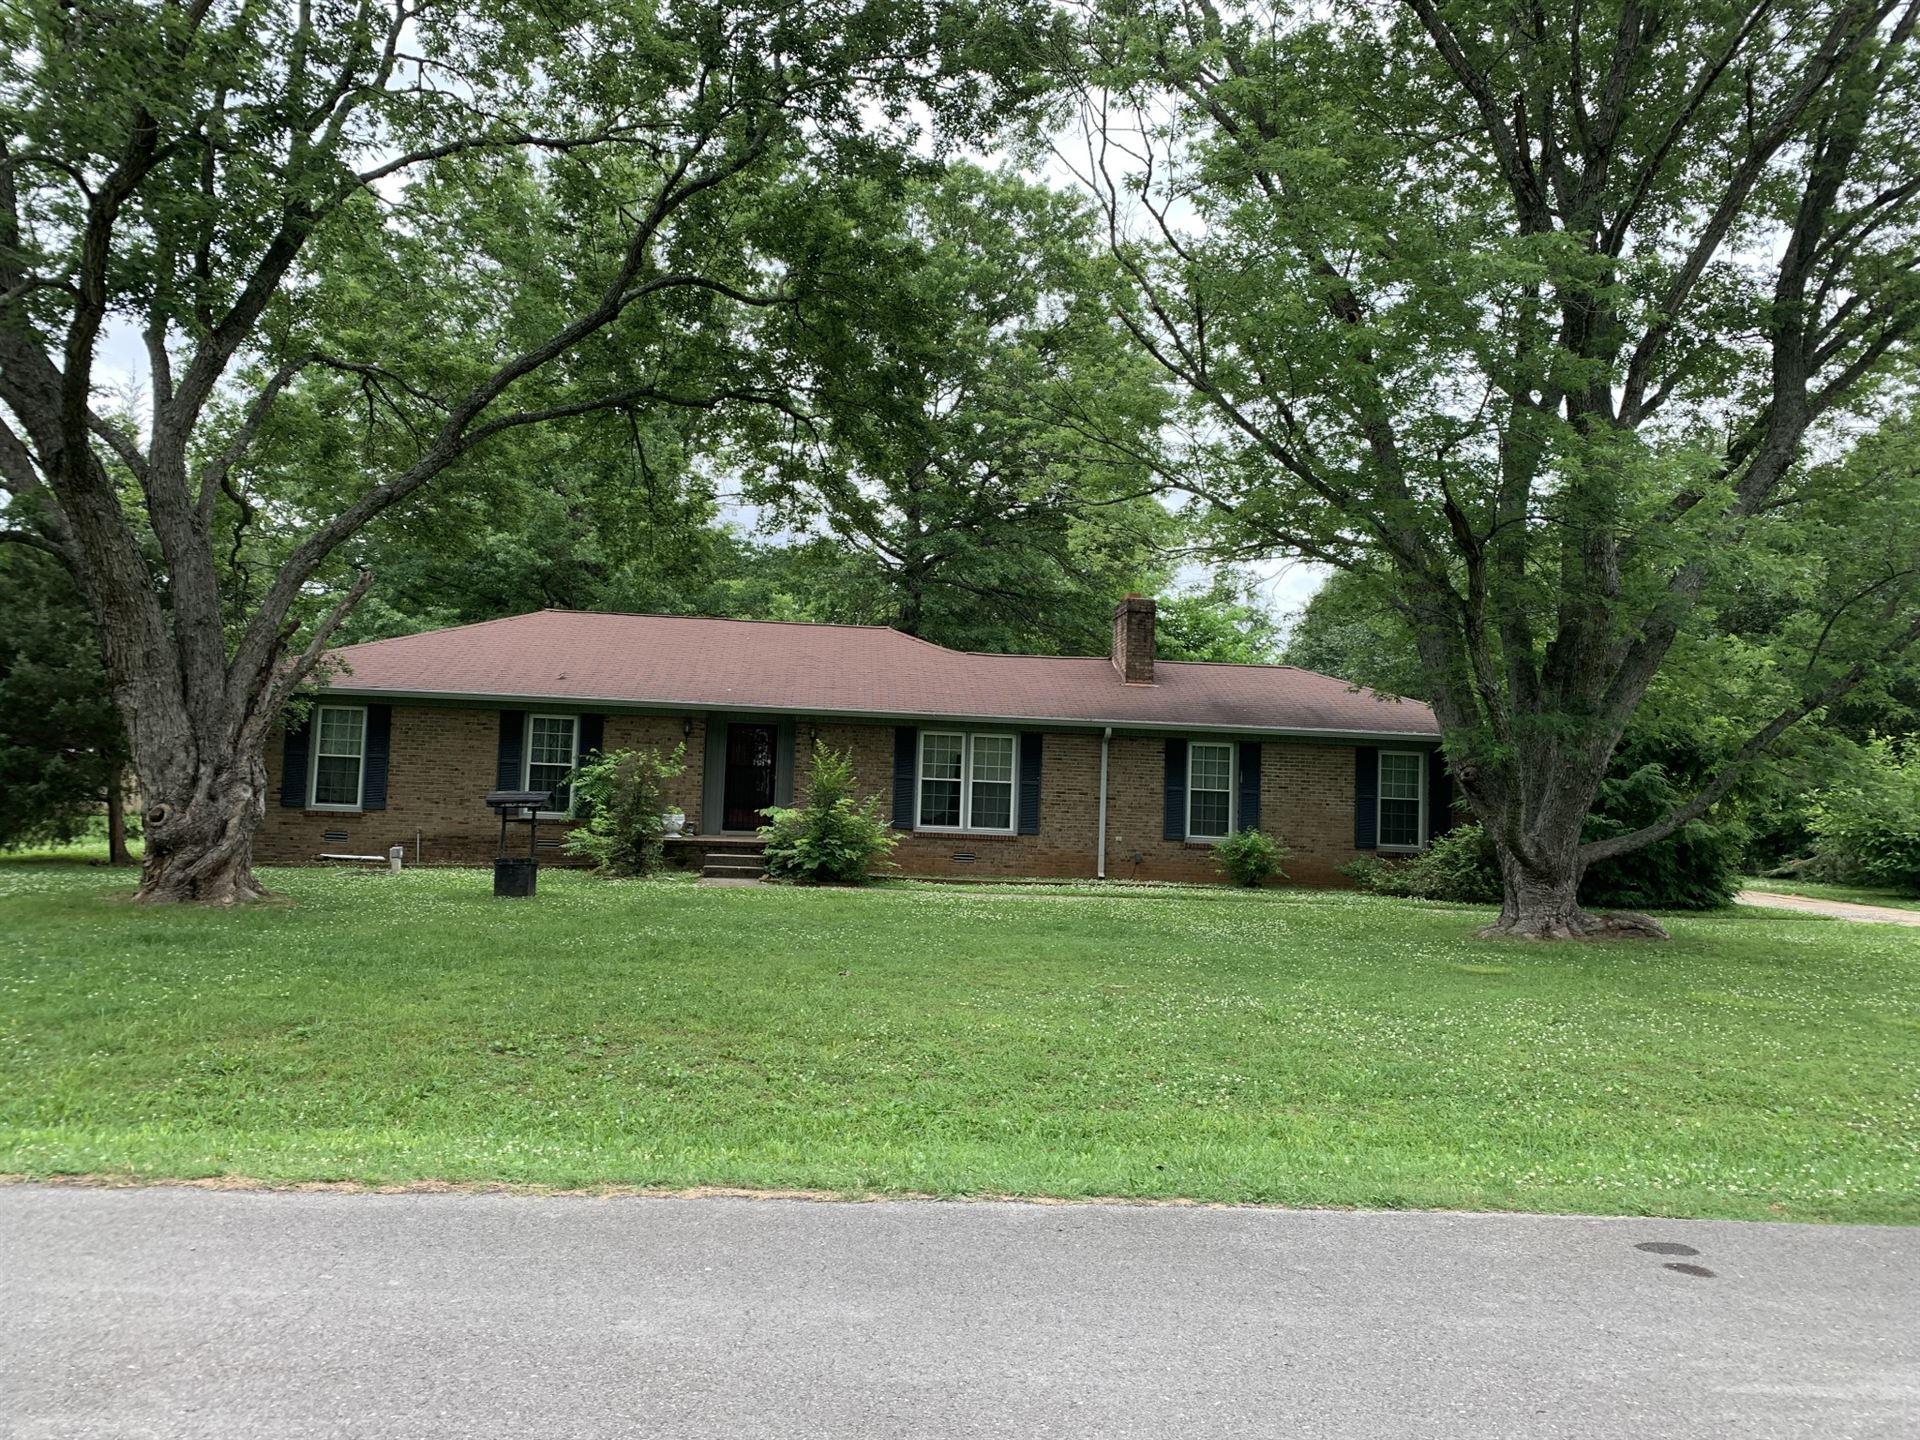 2446 Foxcroft Rd, Murfreesboro, TN 37128 - MLS#: 2261840